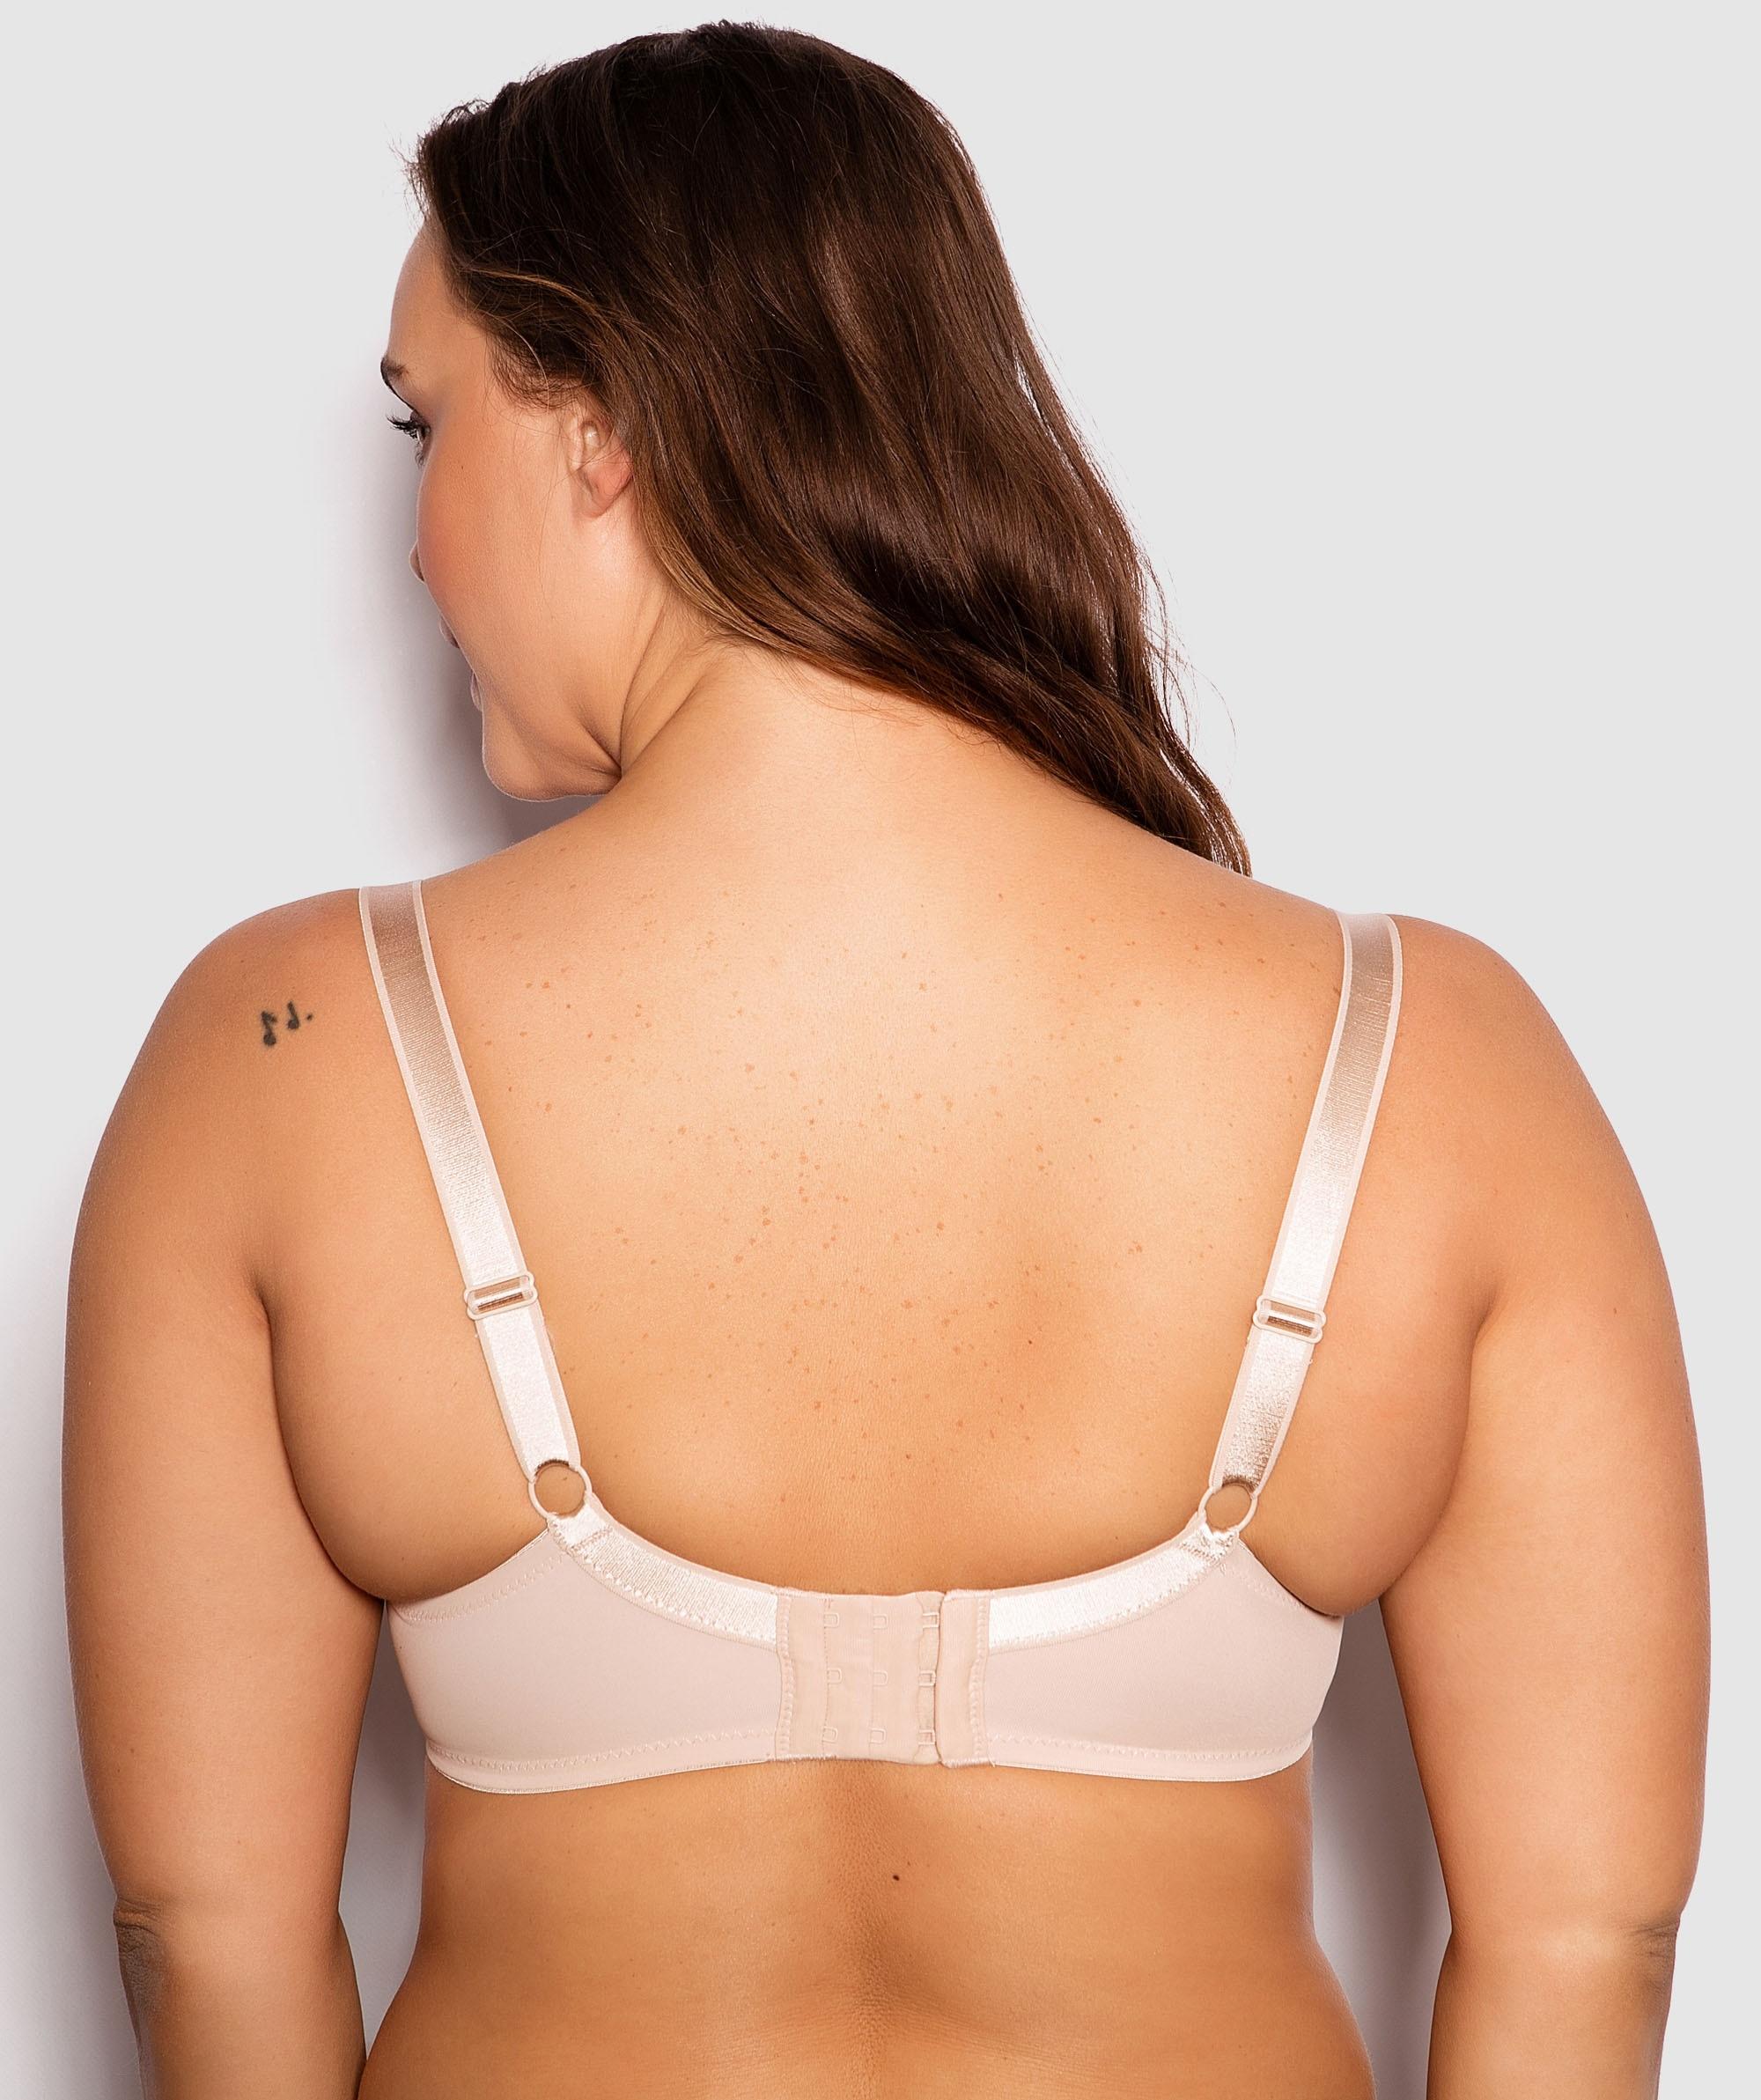 Sapphire Full Cup Bra - Nude